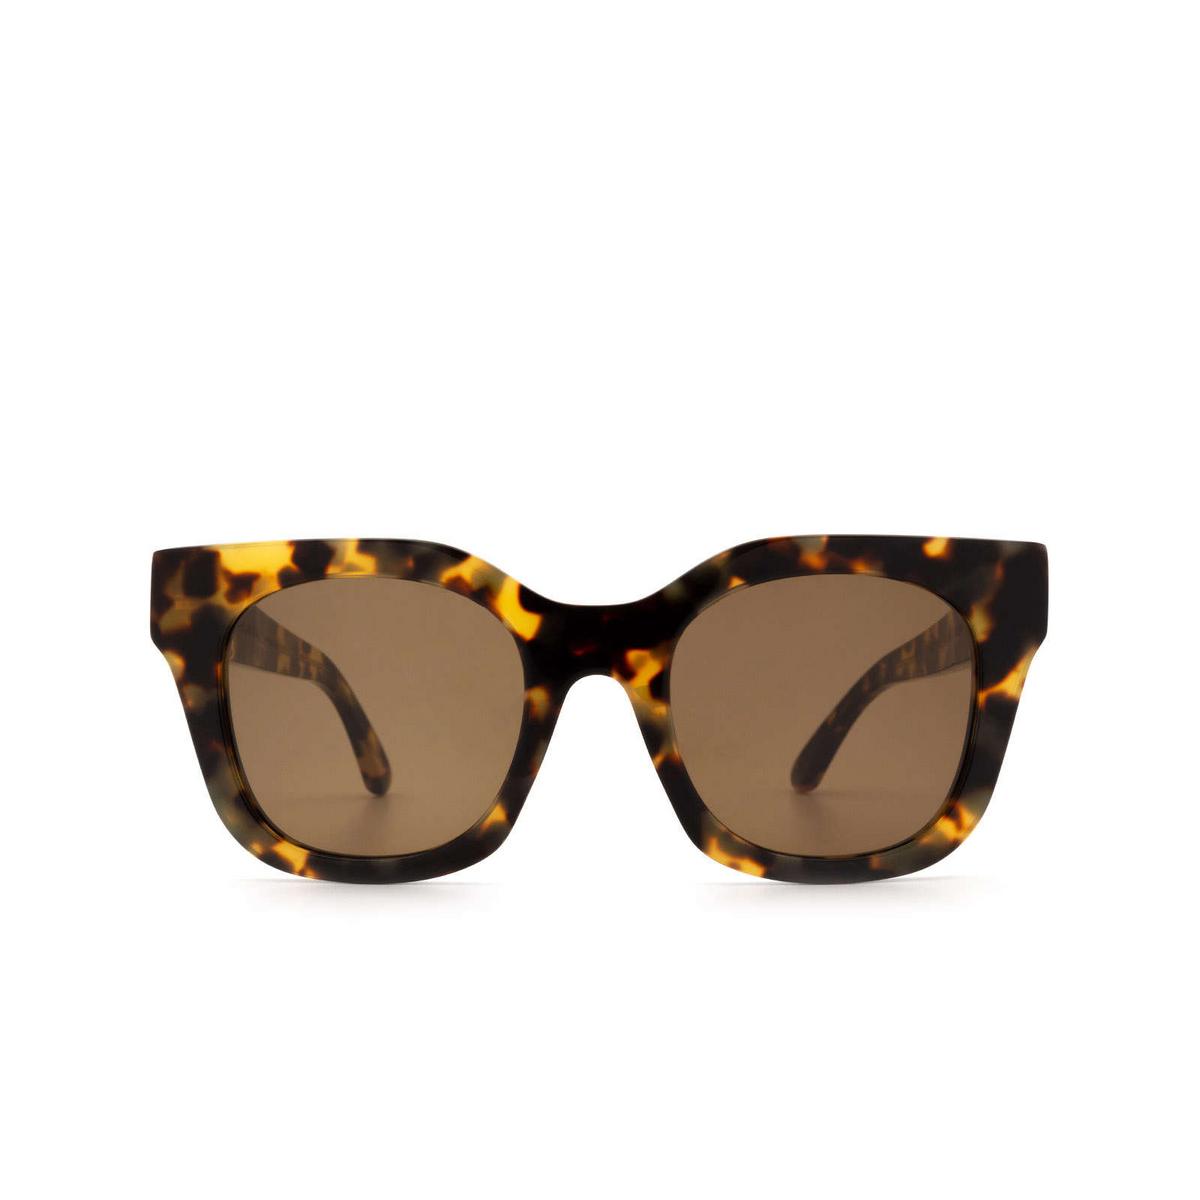 Huma® Square Sunglasses: Blue color Havana Leo 19 - front view.